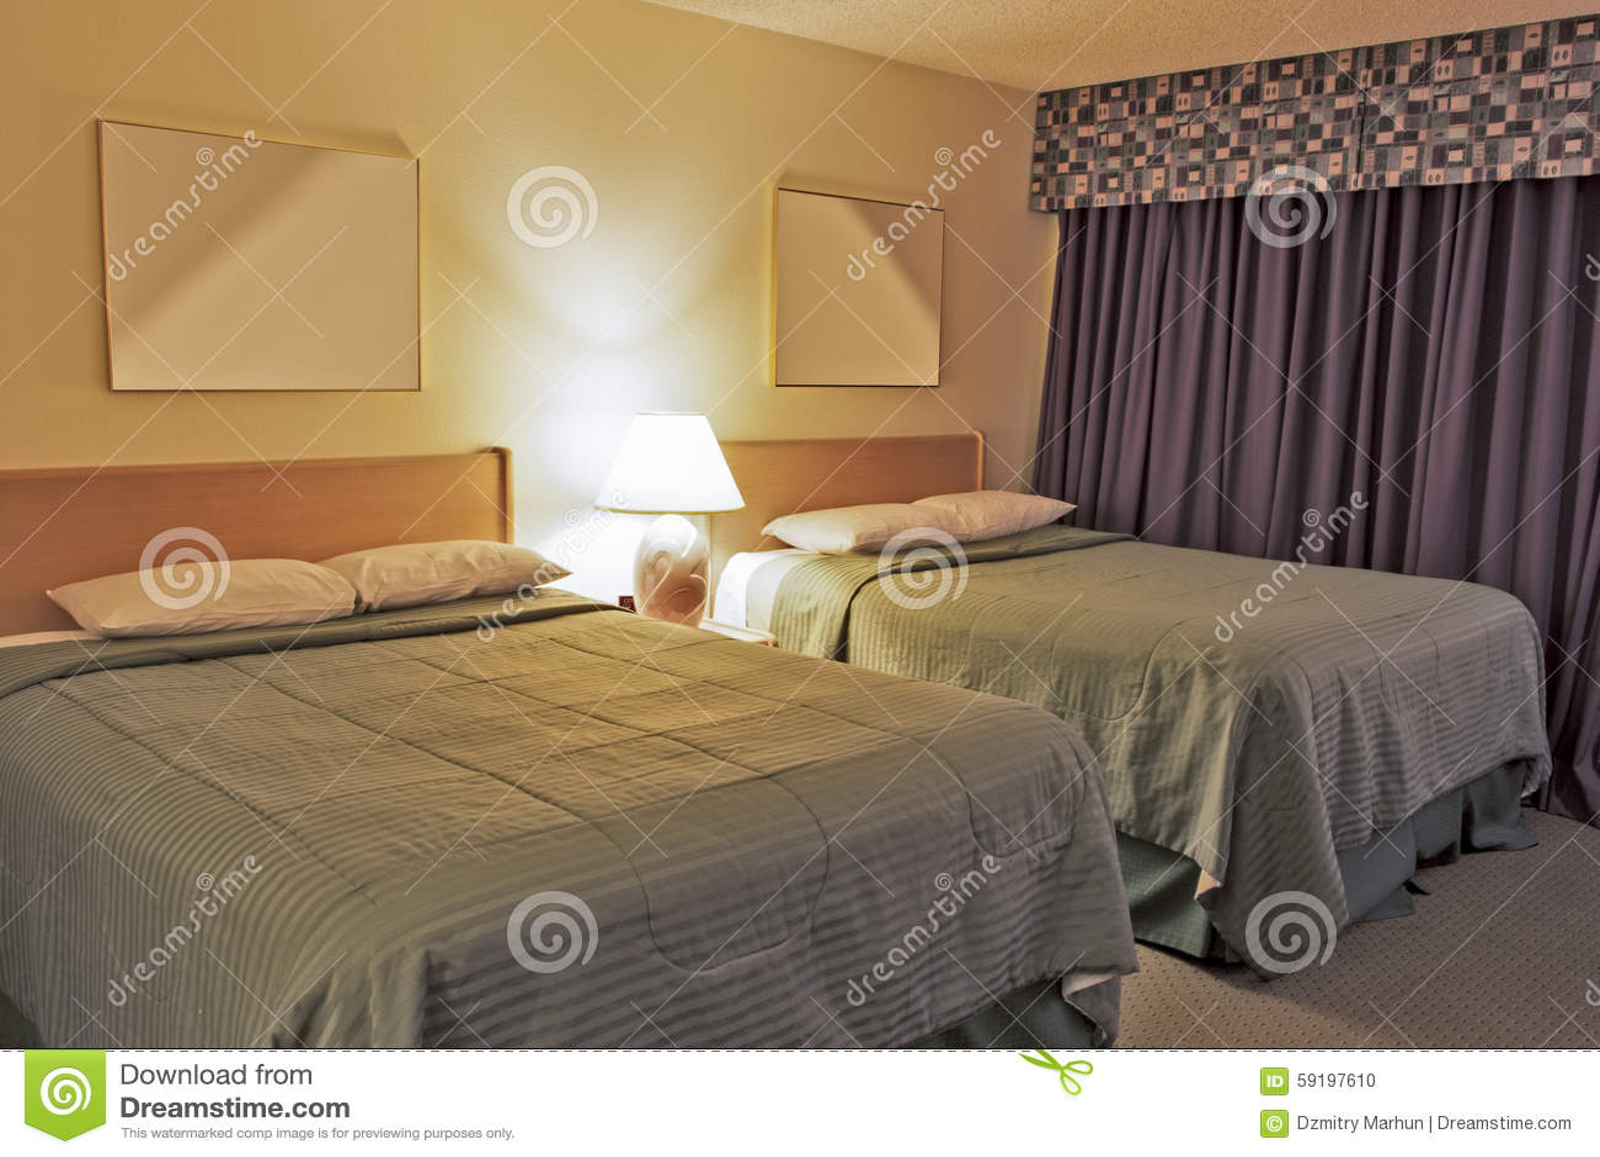 Camera Da Letto Contemporanea Moderna Con Due Re Size Beds ...